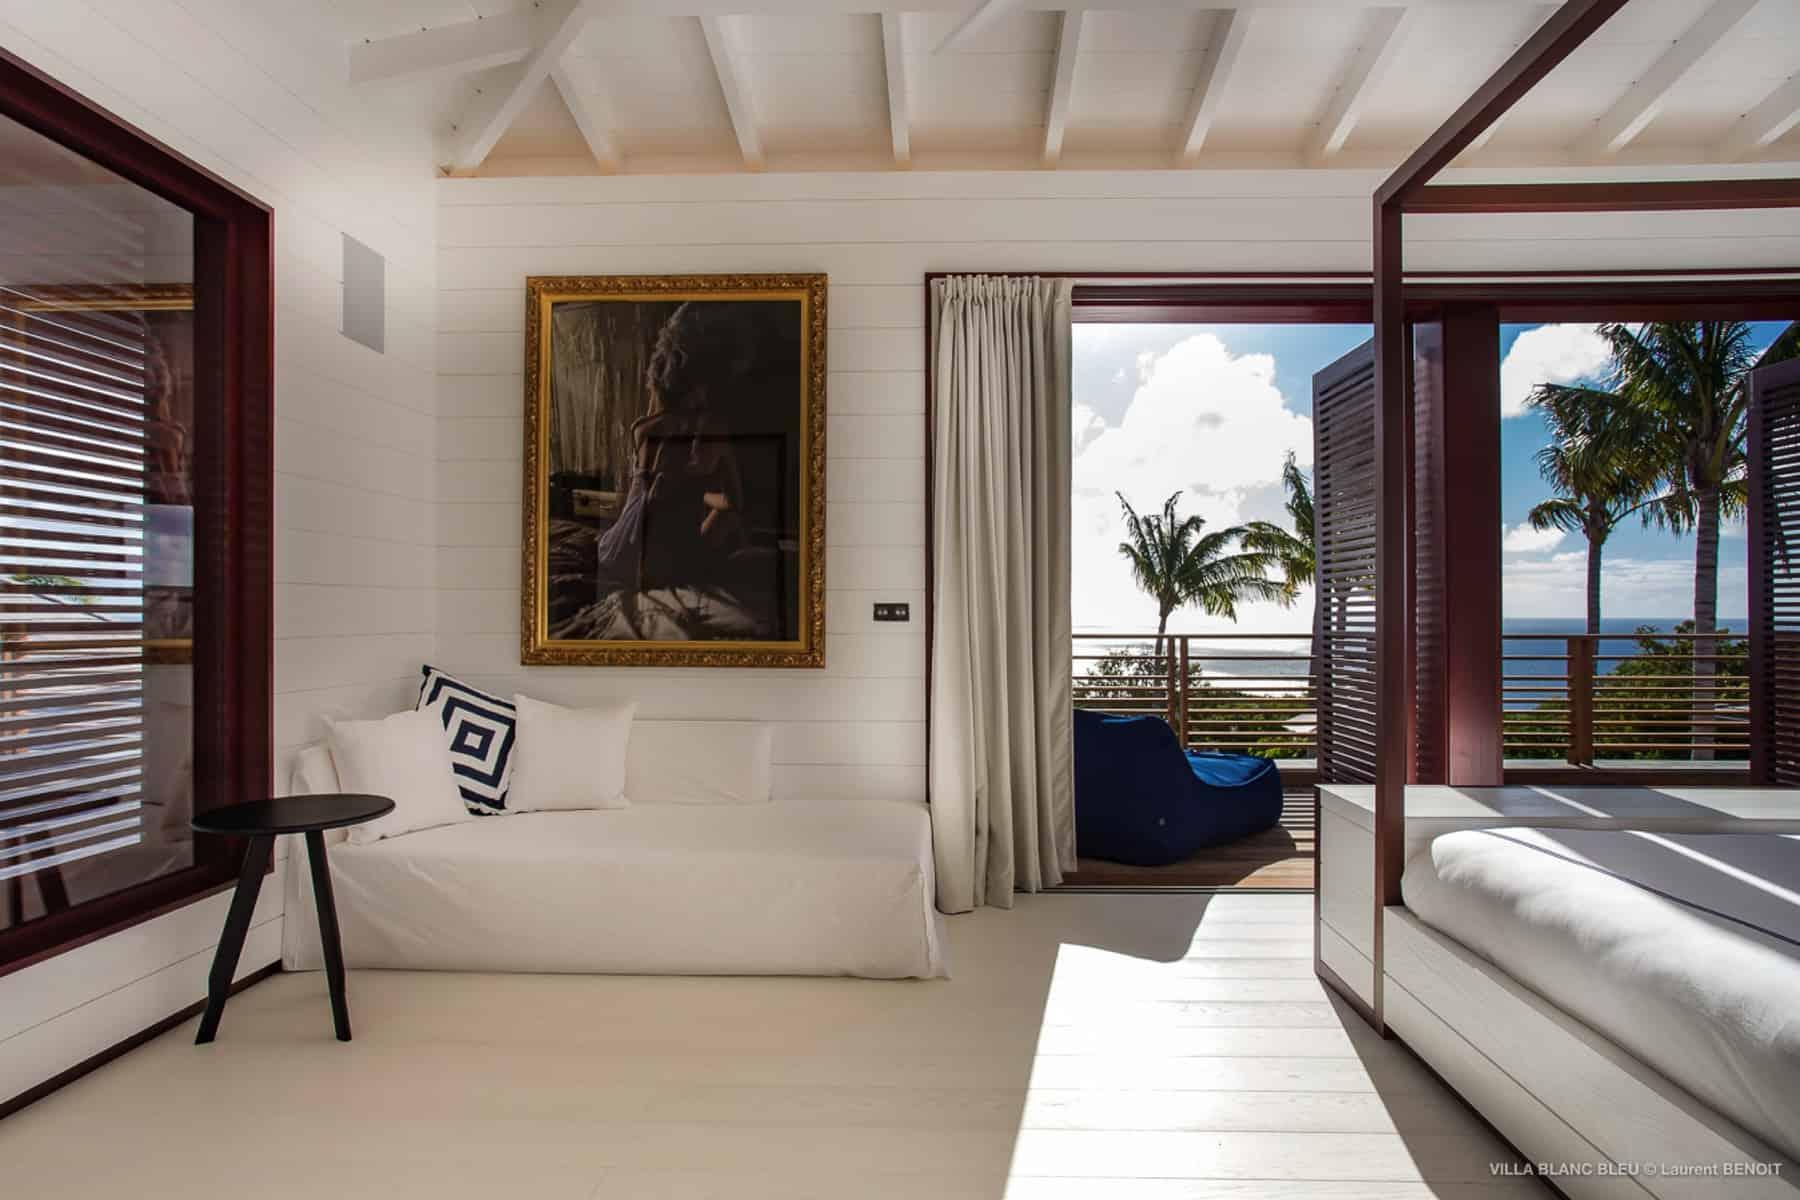 Couch Villa Blanc Bleu St Barths